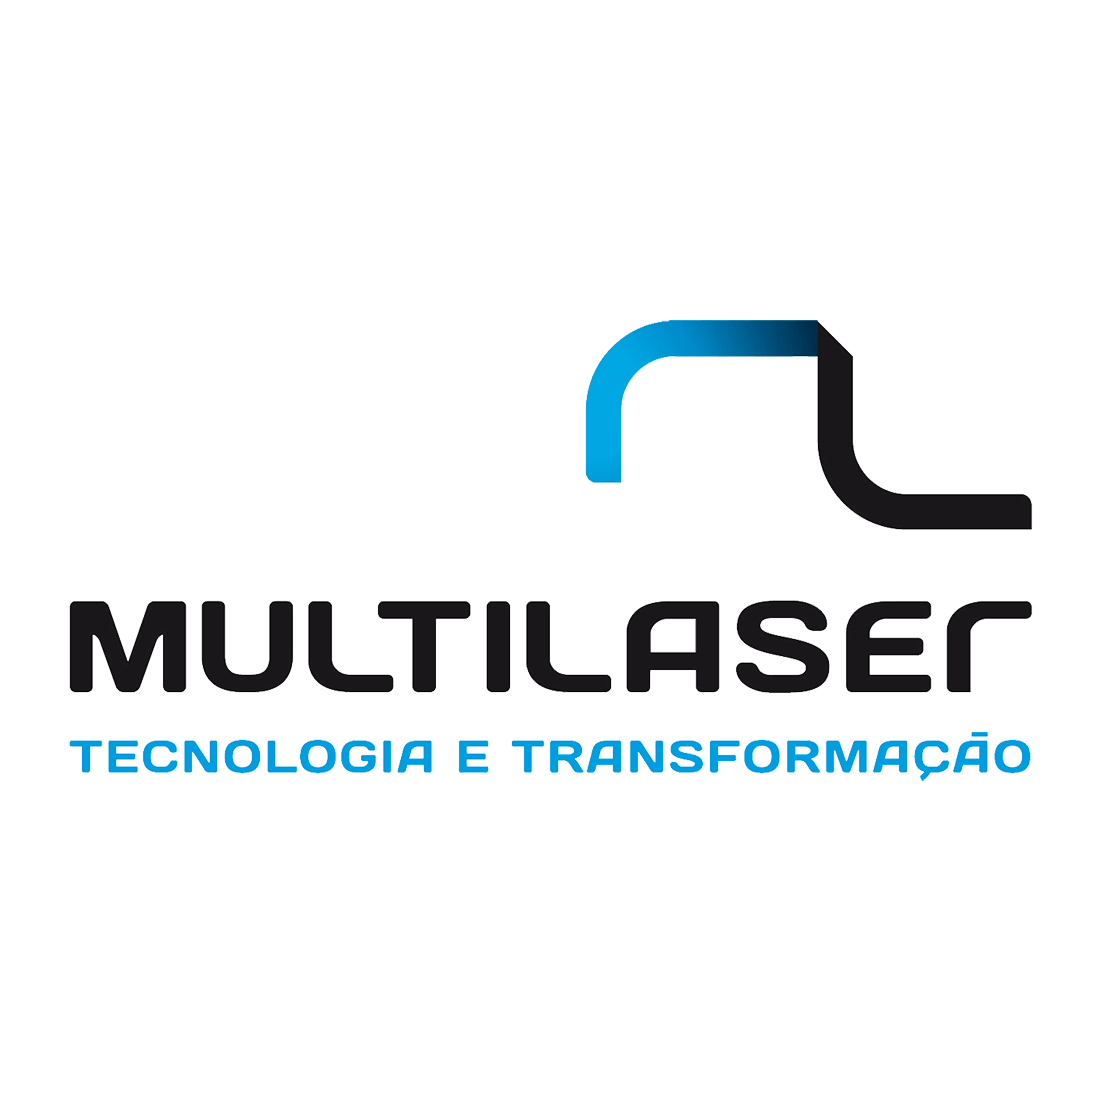 Multilaser-Contato